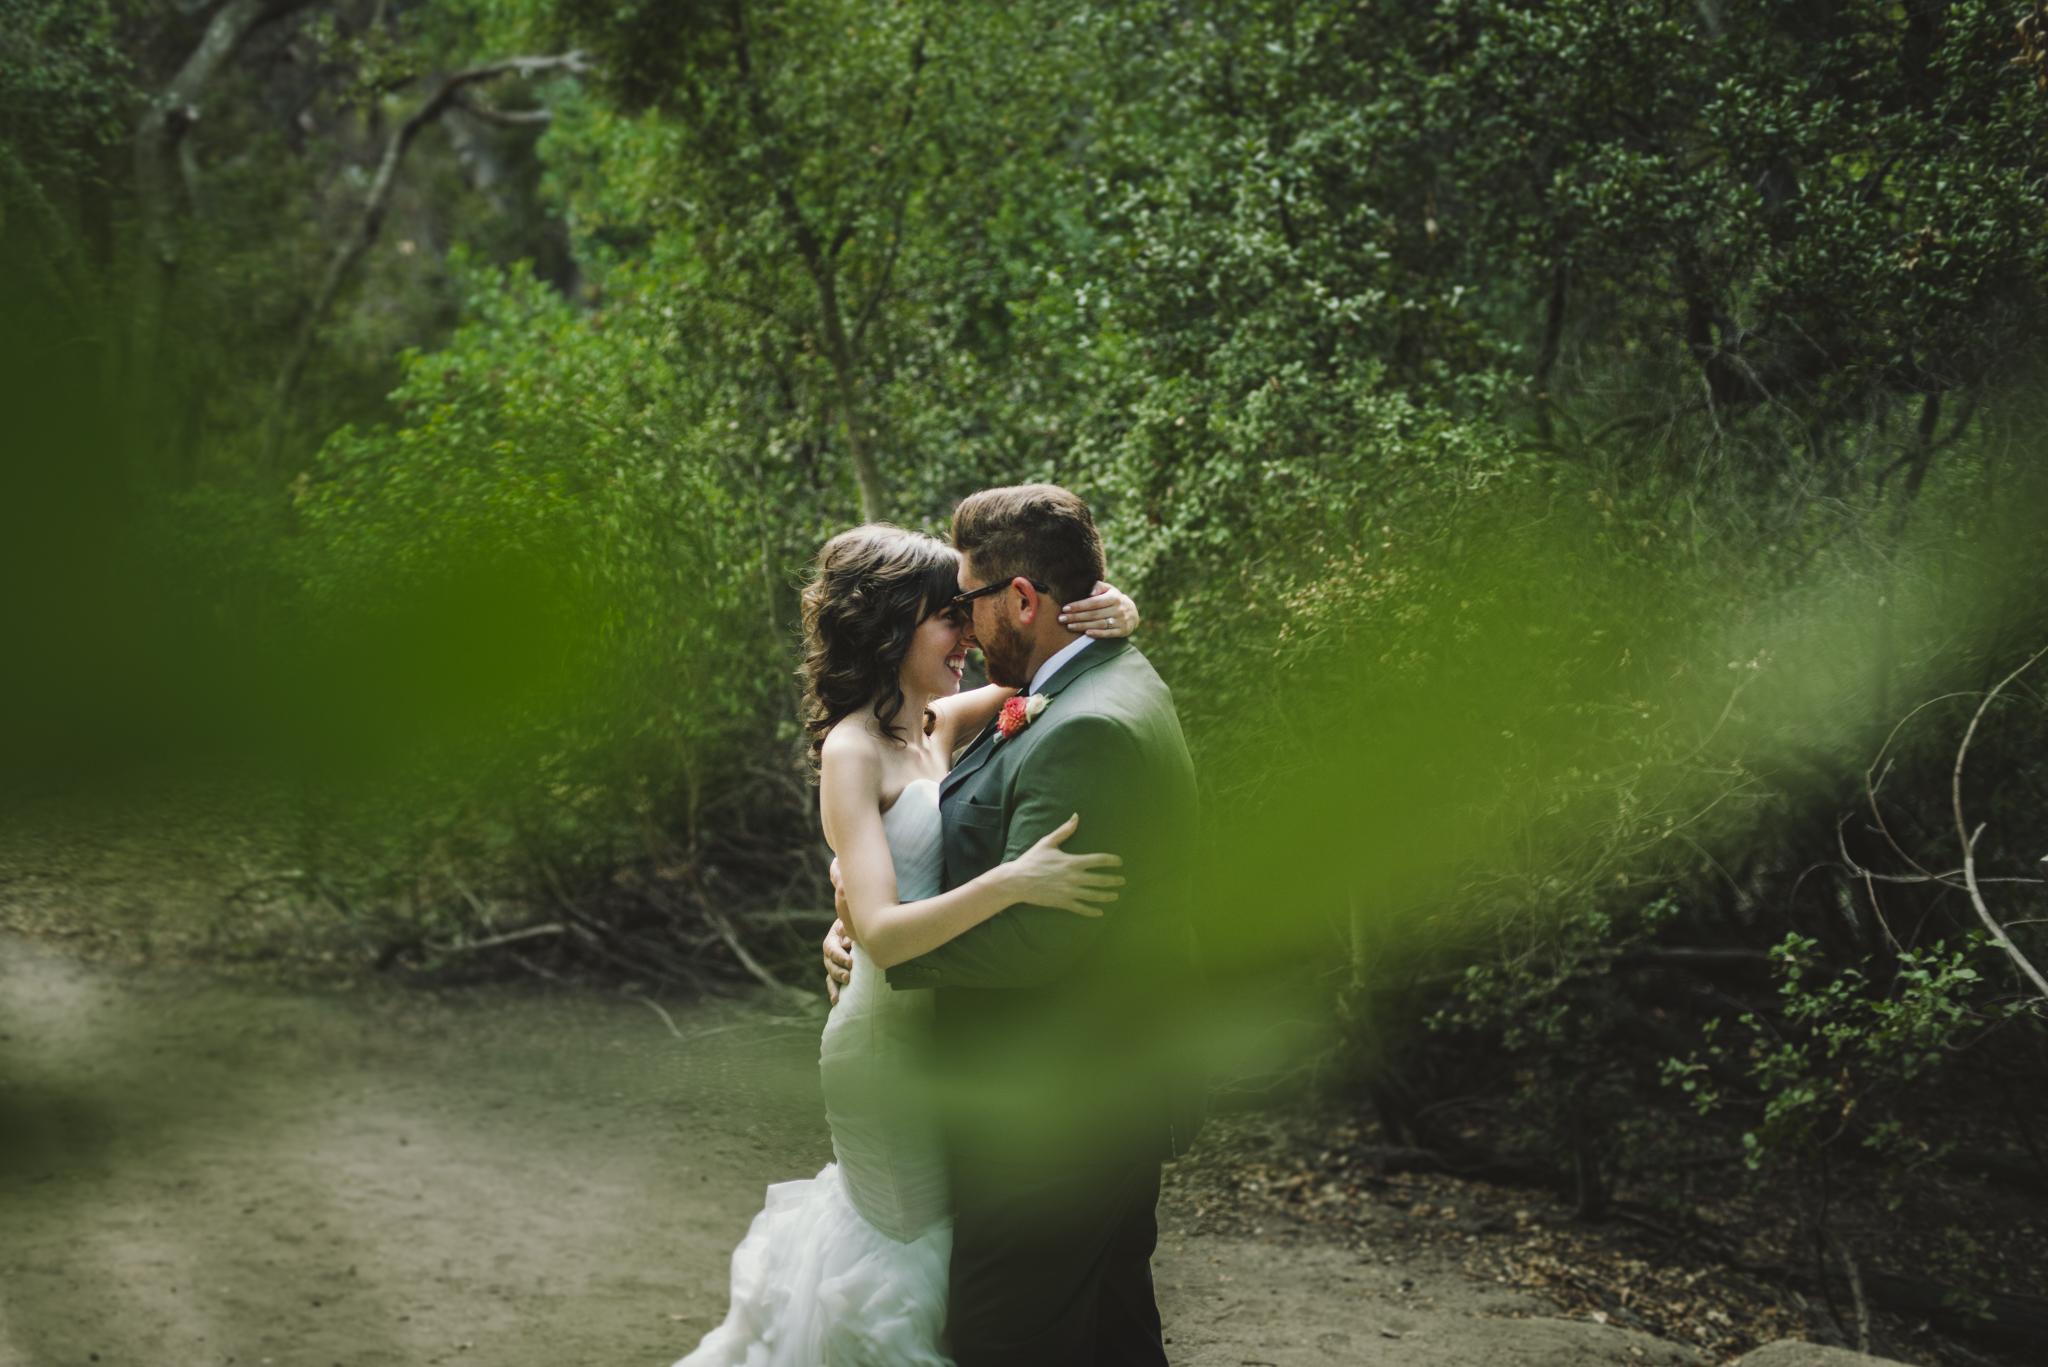 Isaiah & Taylor Photography - Los Angeles Lifestyle Wedding Photographer-34.jpg